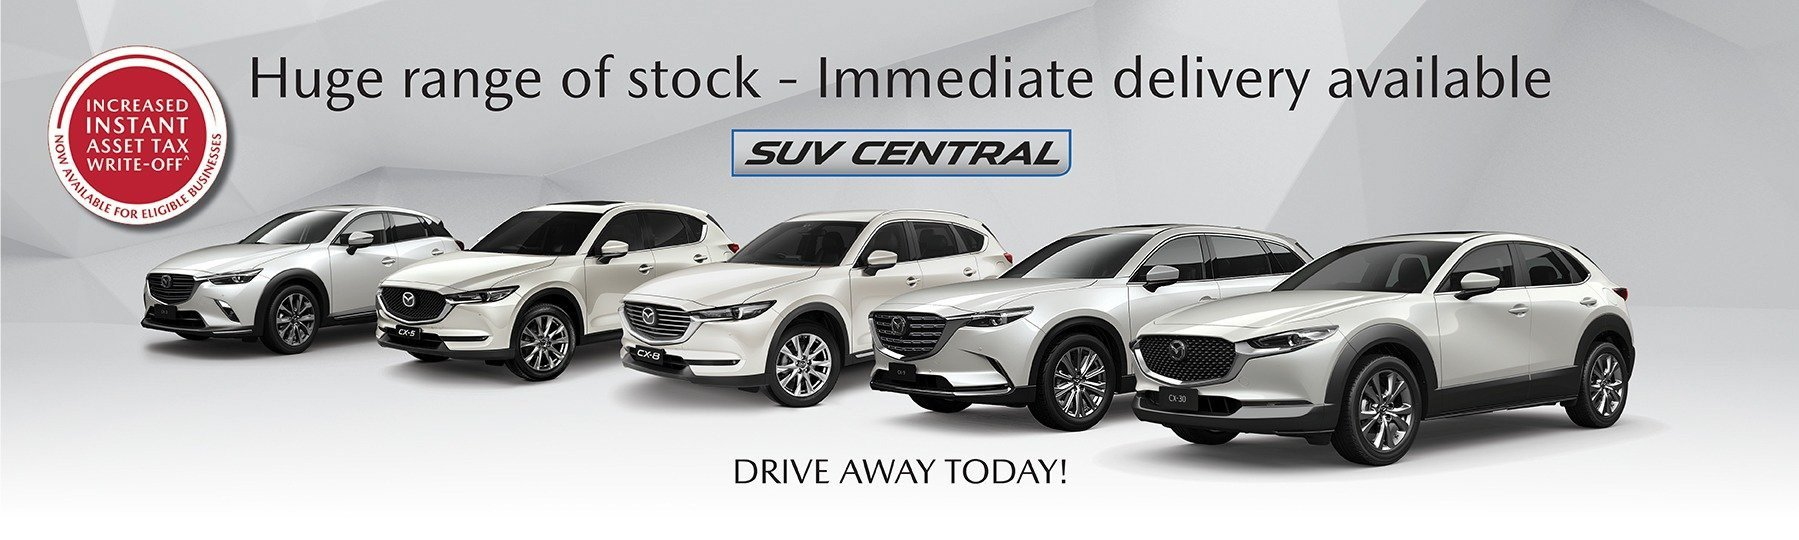 SUV Central